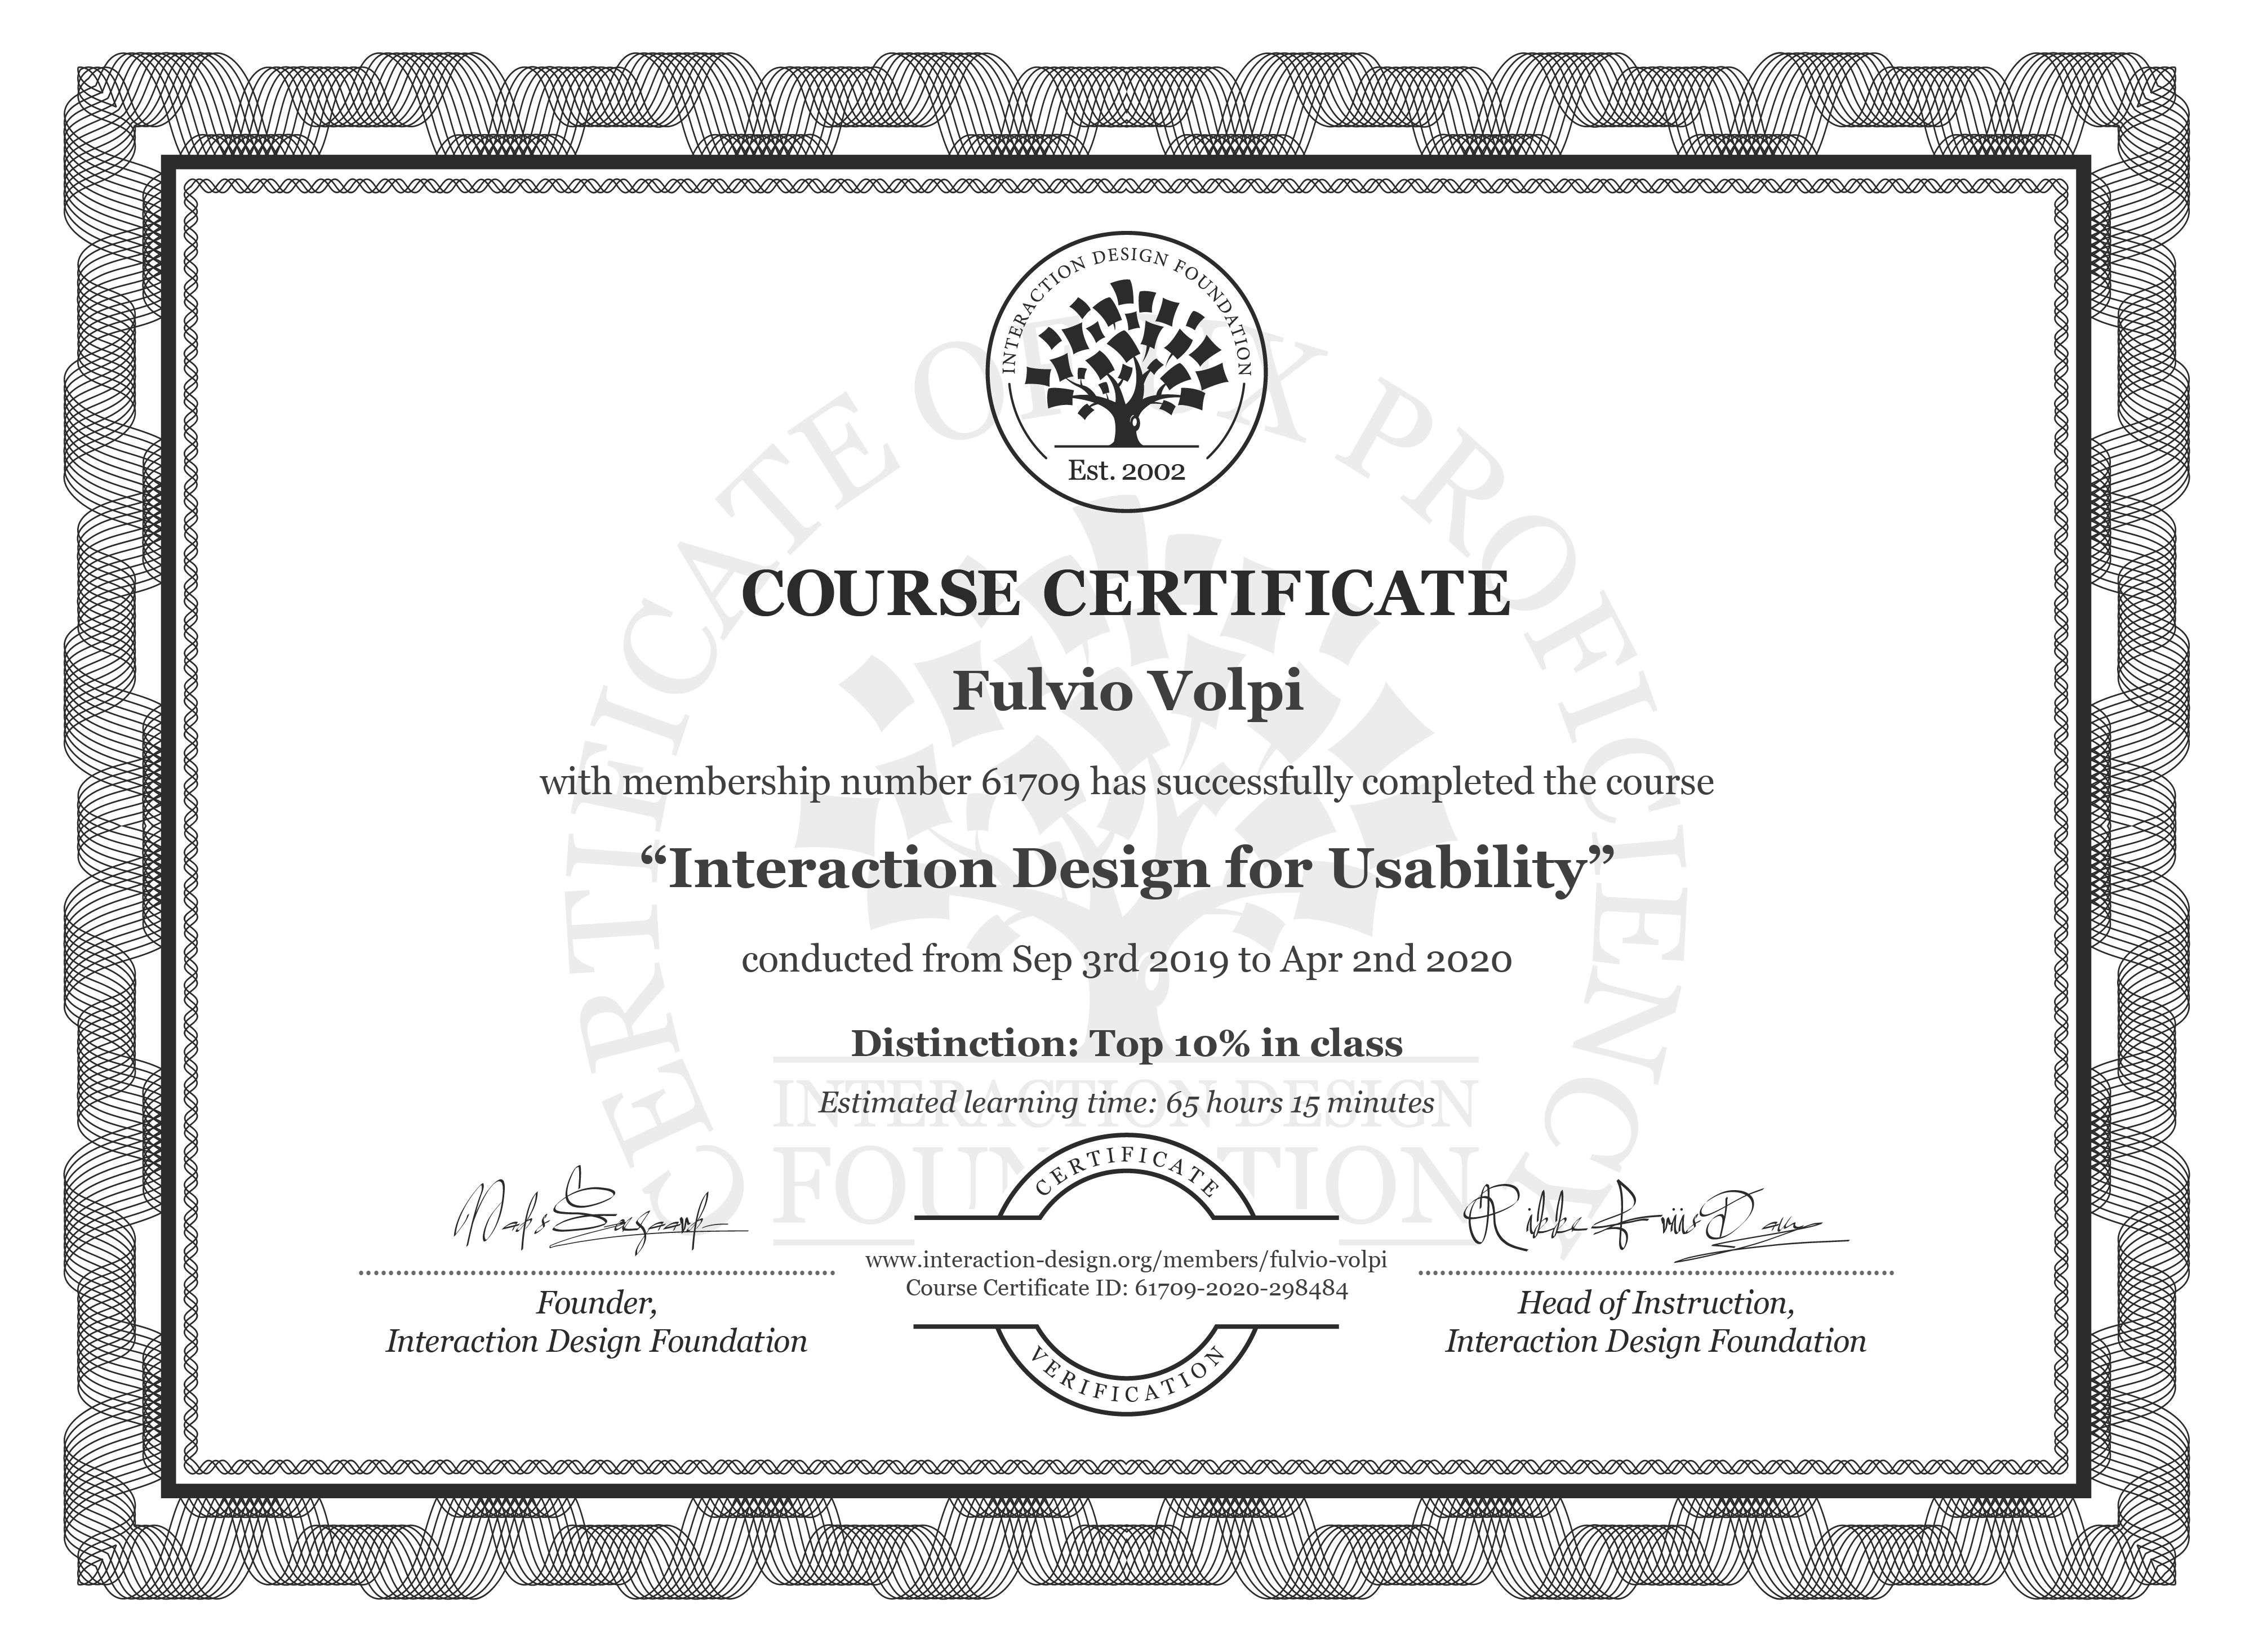 Fulvio Volpi's Course Certificate: Interaction Design for Usability